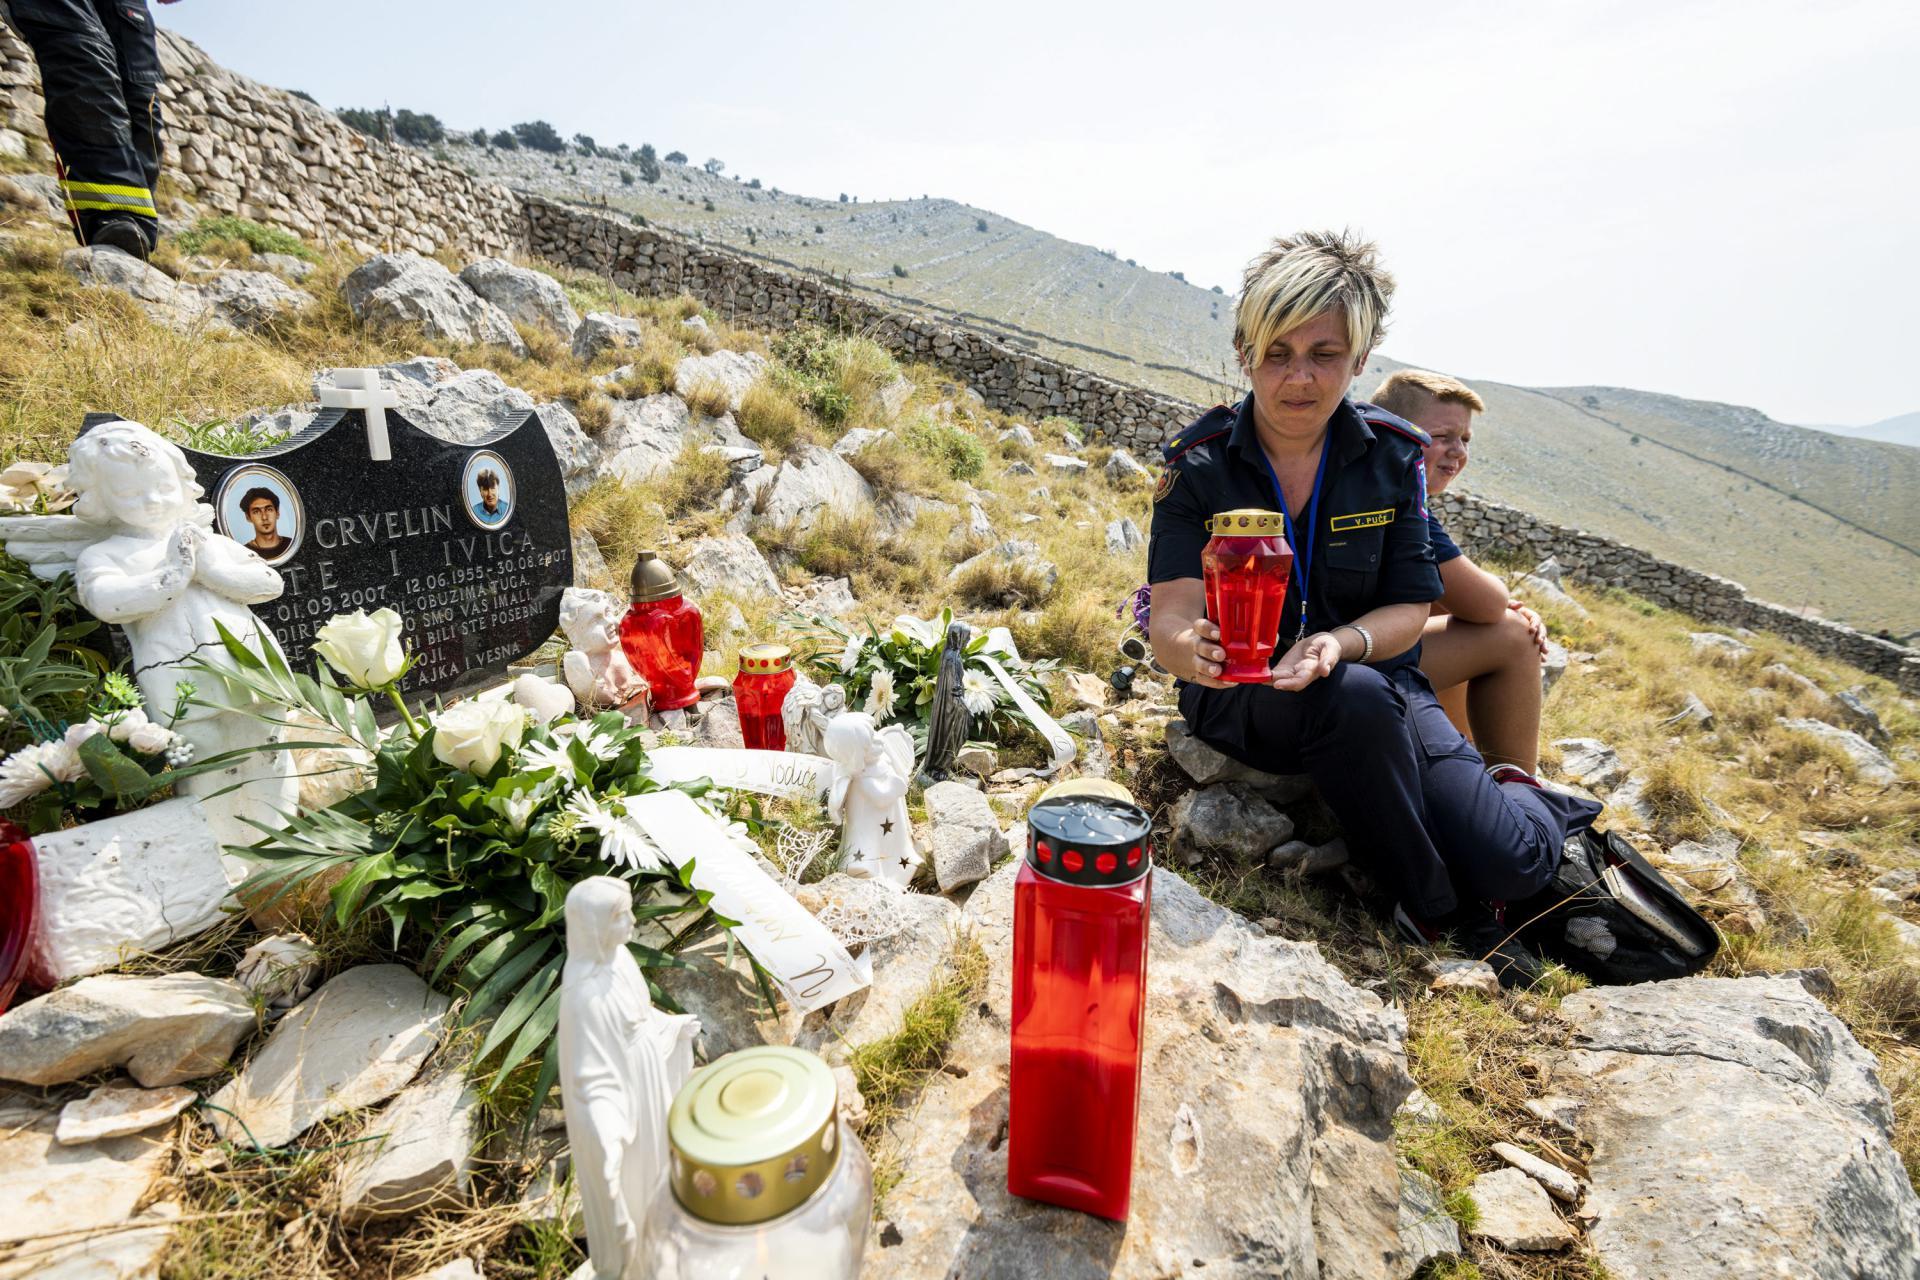 Sestra i kći stradalih vatrogasaca Vesmna Crvelin